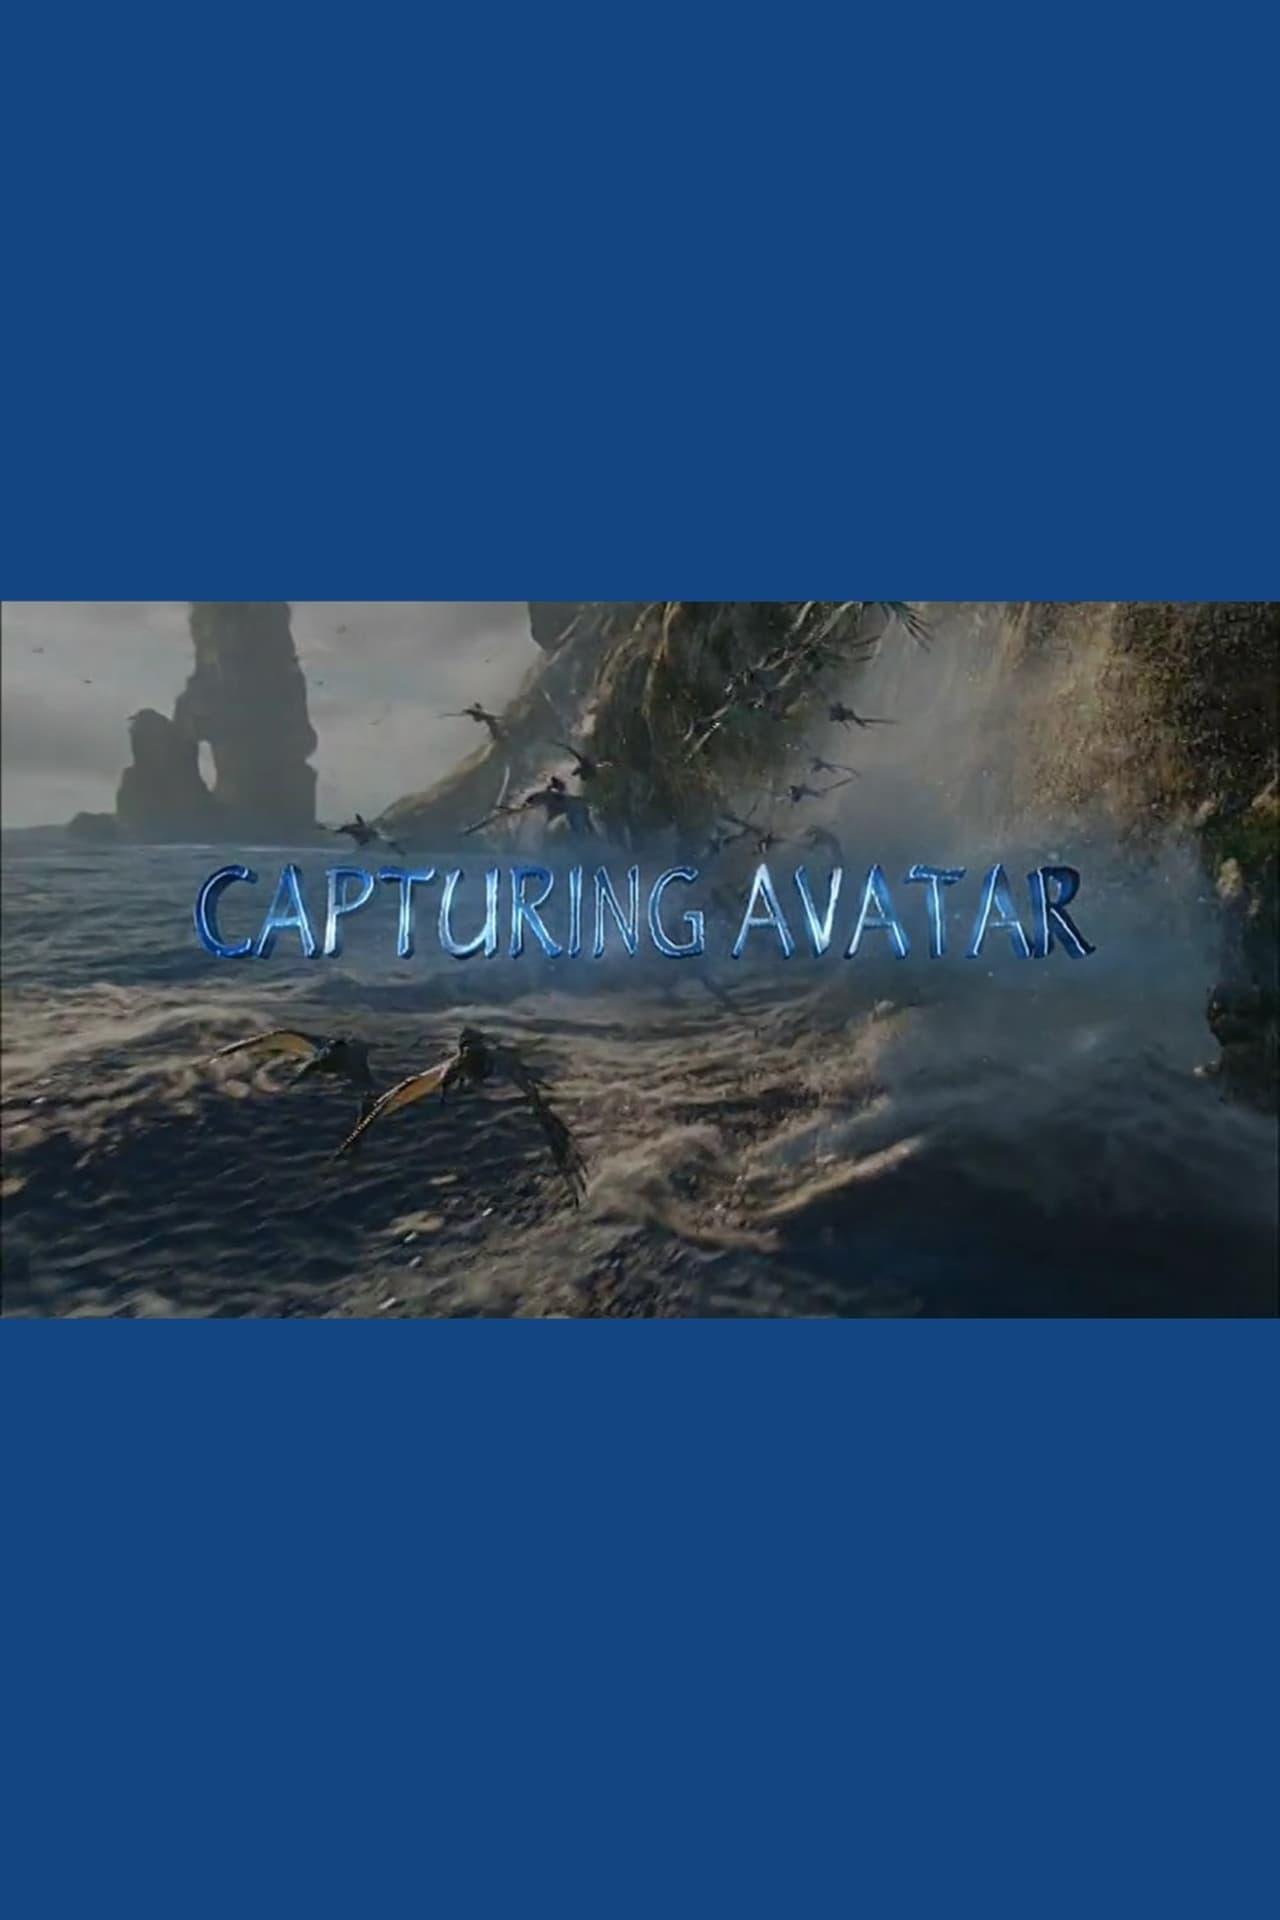 Capturing Avatar